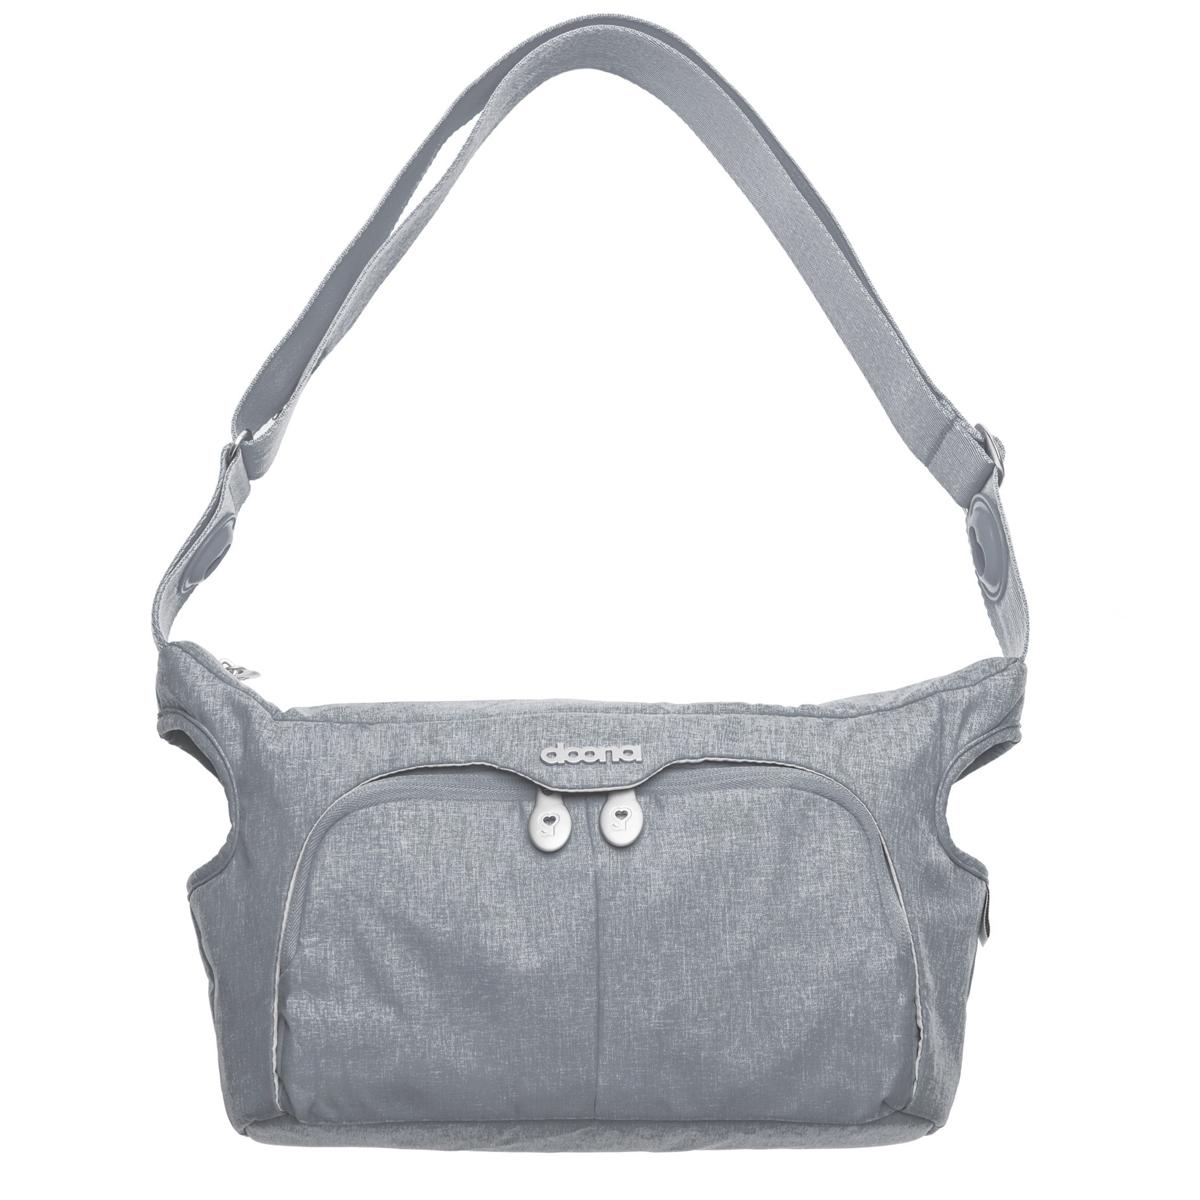 Sac à langer Sac à Langer Essential Bag - Gris Sac à Langer Essential Bag - Gris